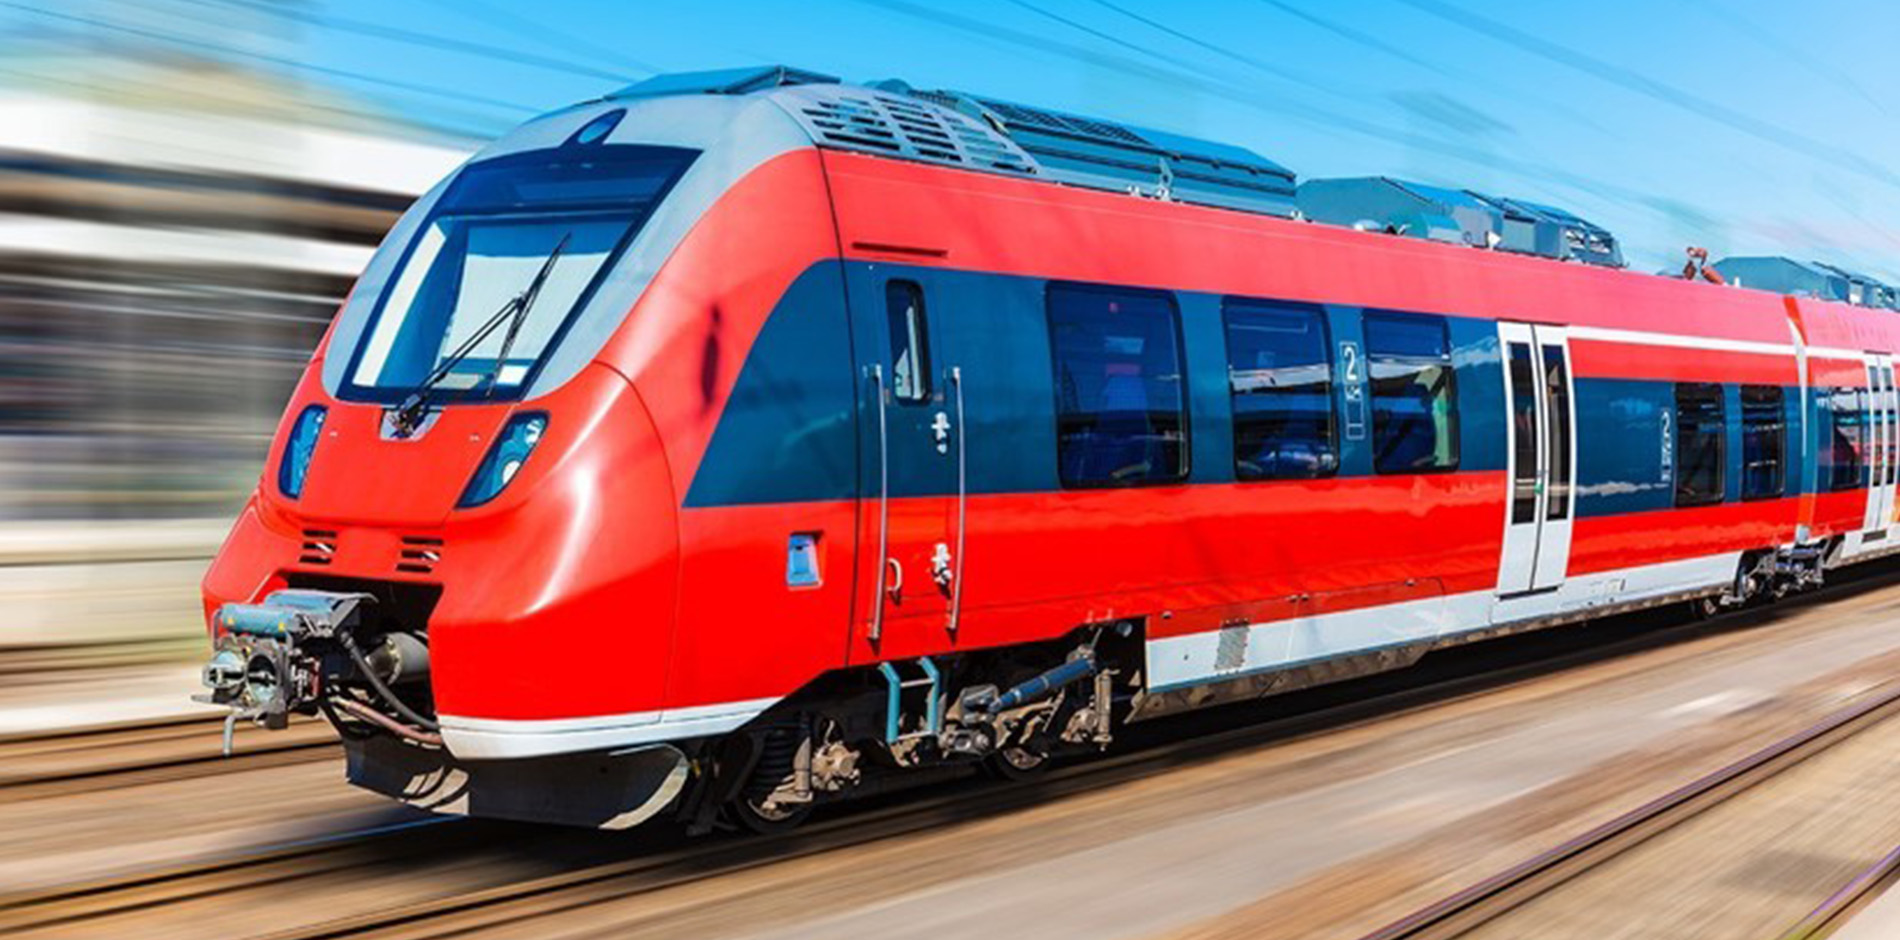 garnica_contrachapado_fireshield_train_1